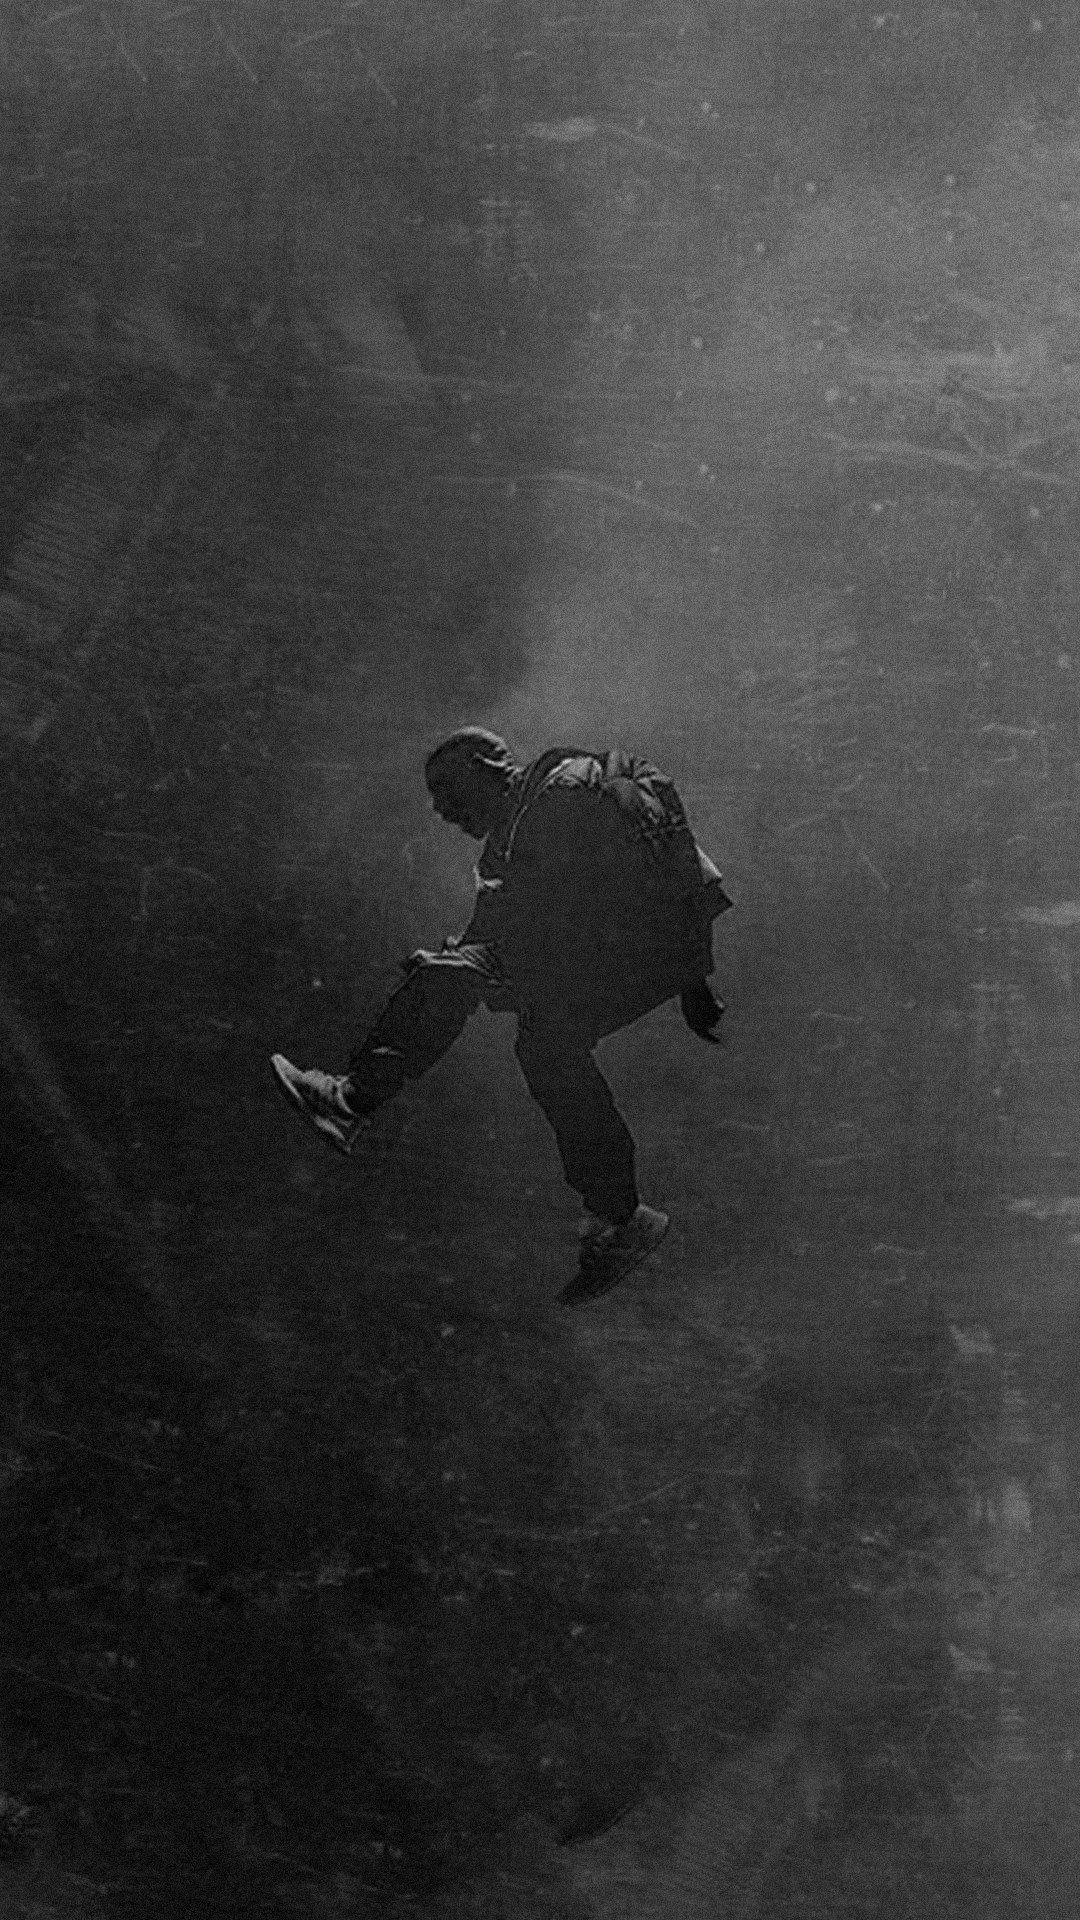 Kanye West Samsung Galaxy s7 wallpaper